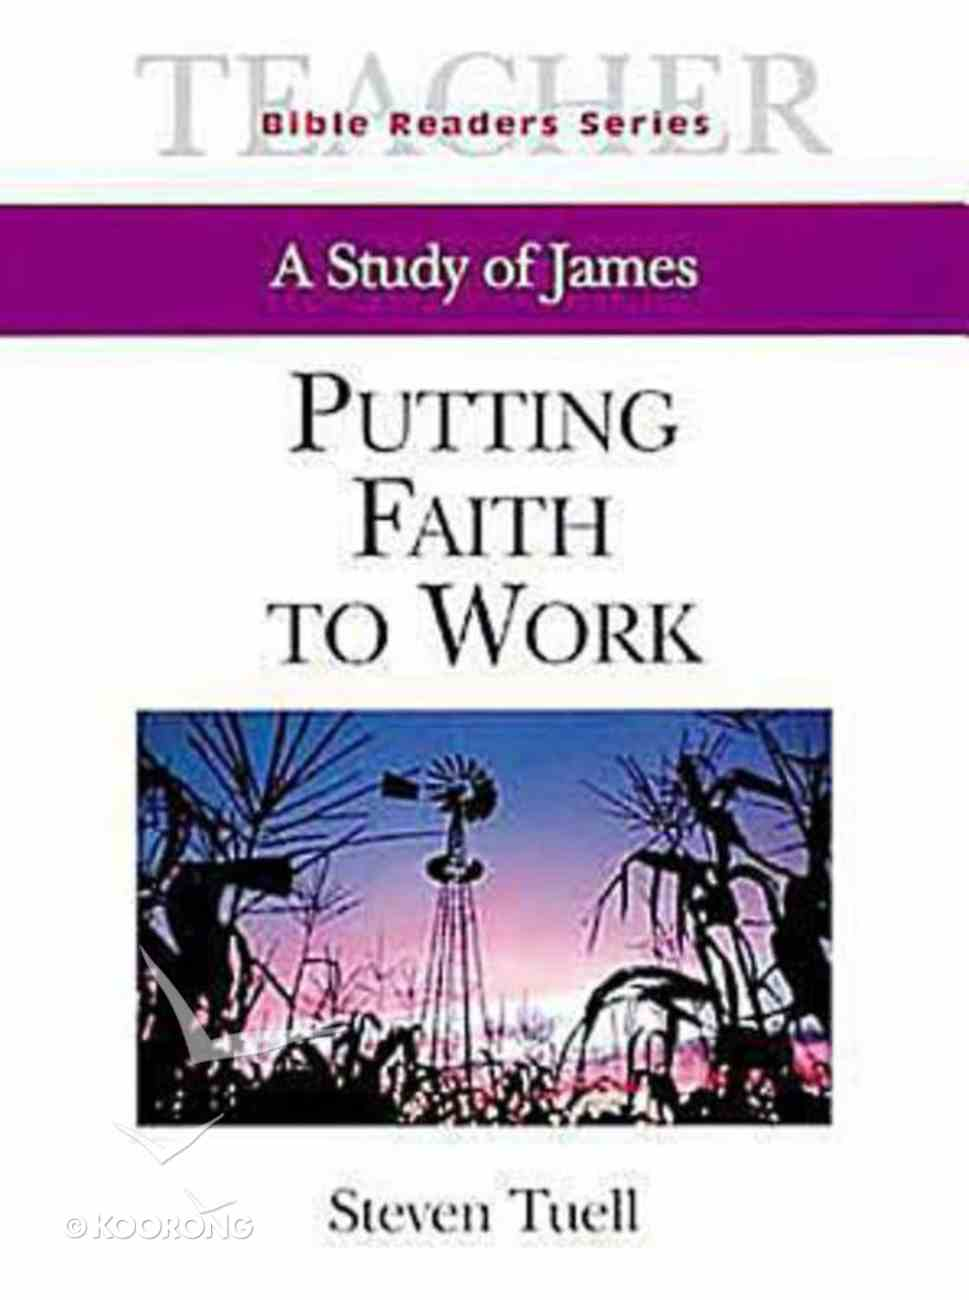 Putting Faith to Work (Teacher's Guide) (Abingdon Bible Reader Series) Paperback